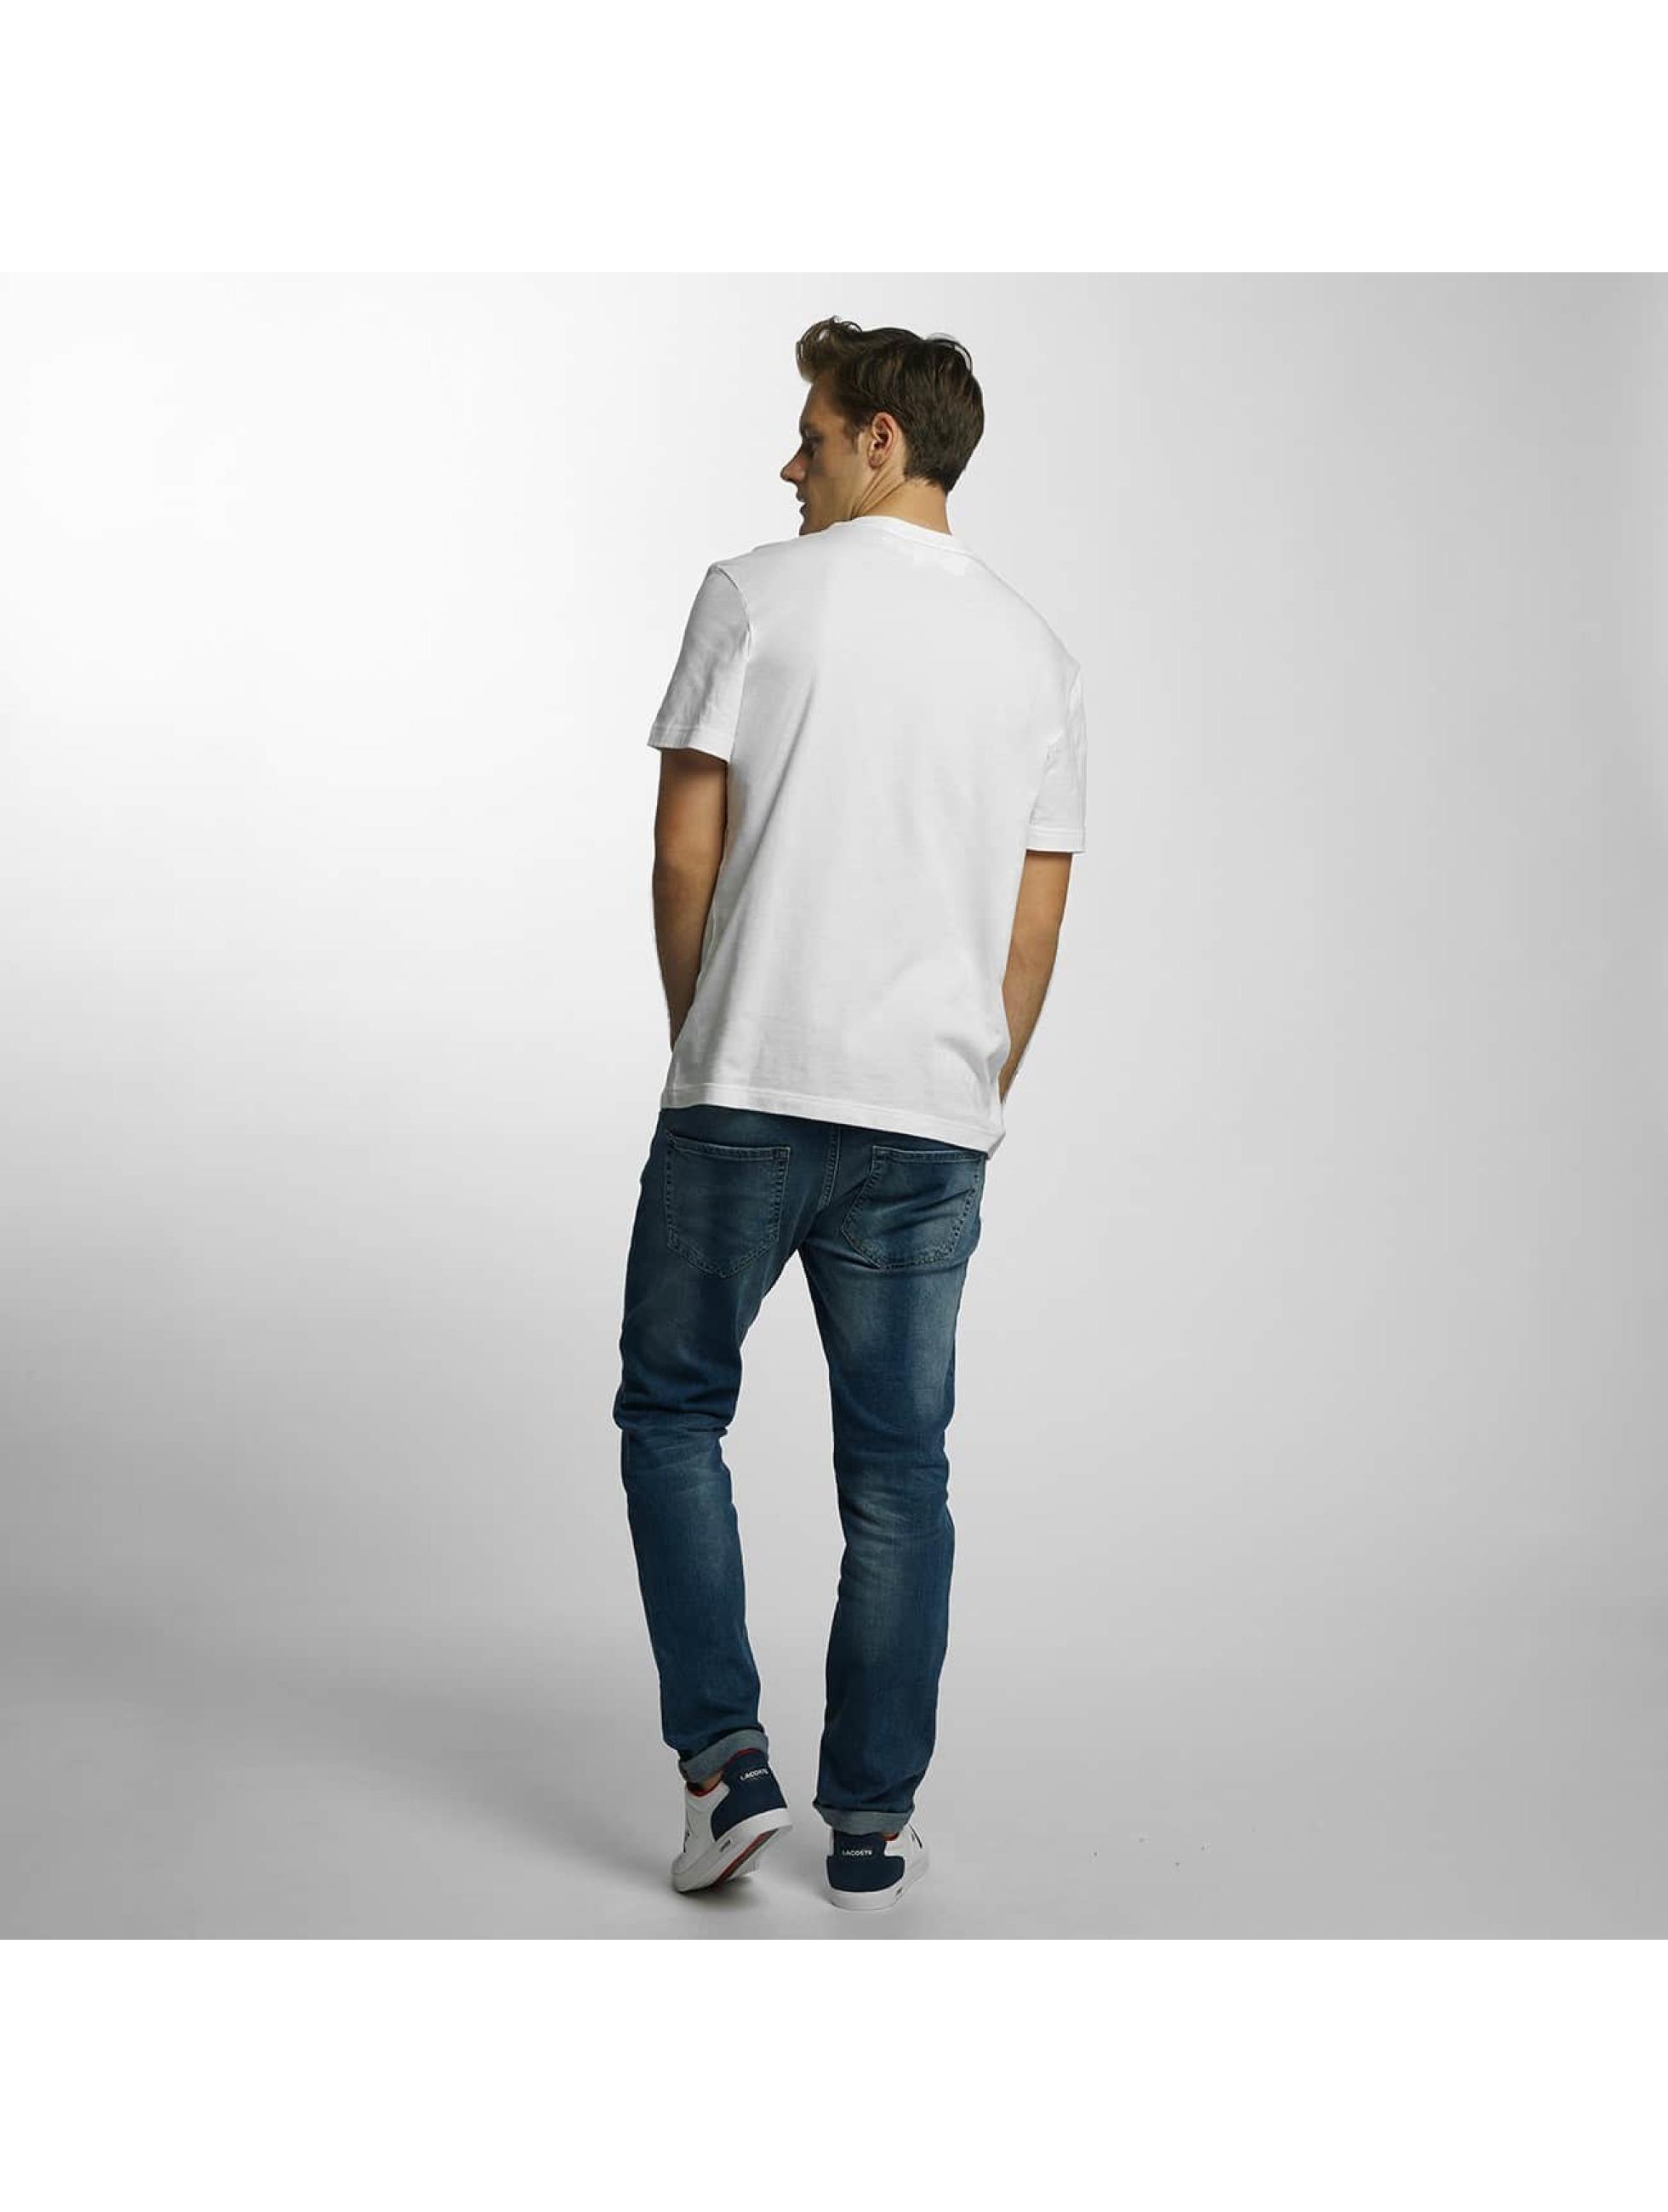 Lacoste T-Shirt Original weiß